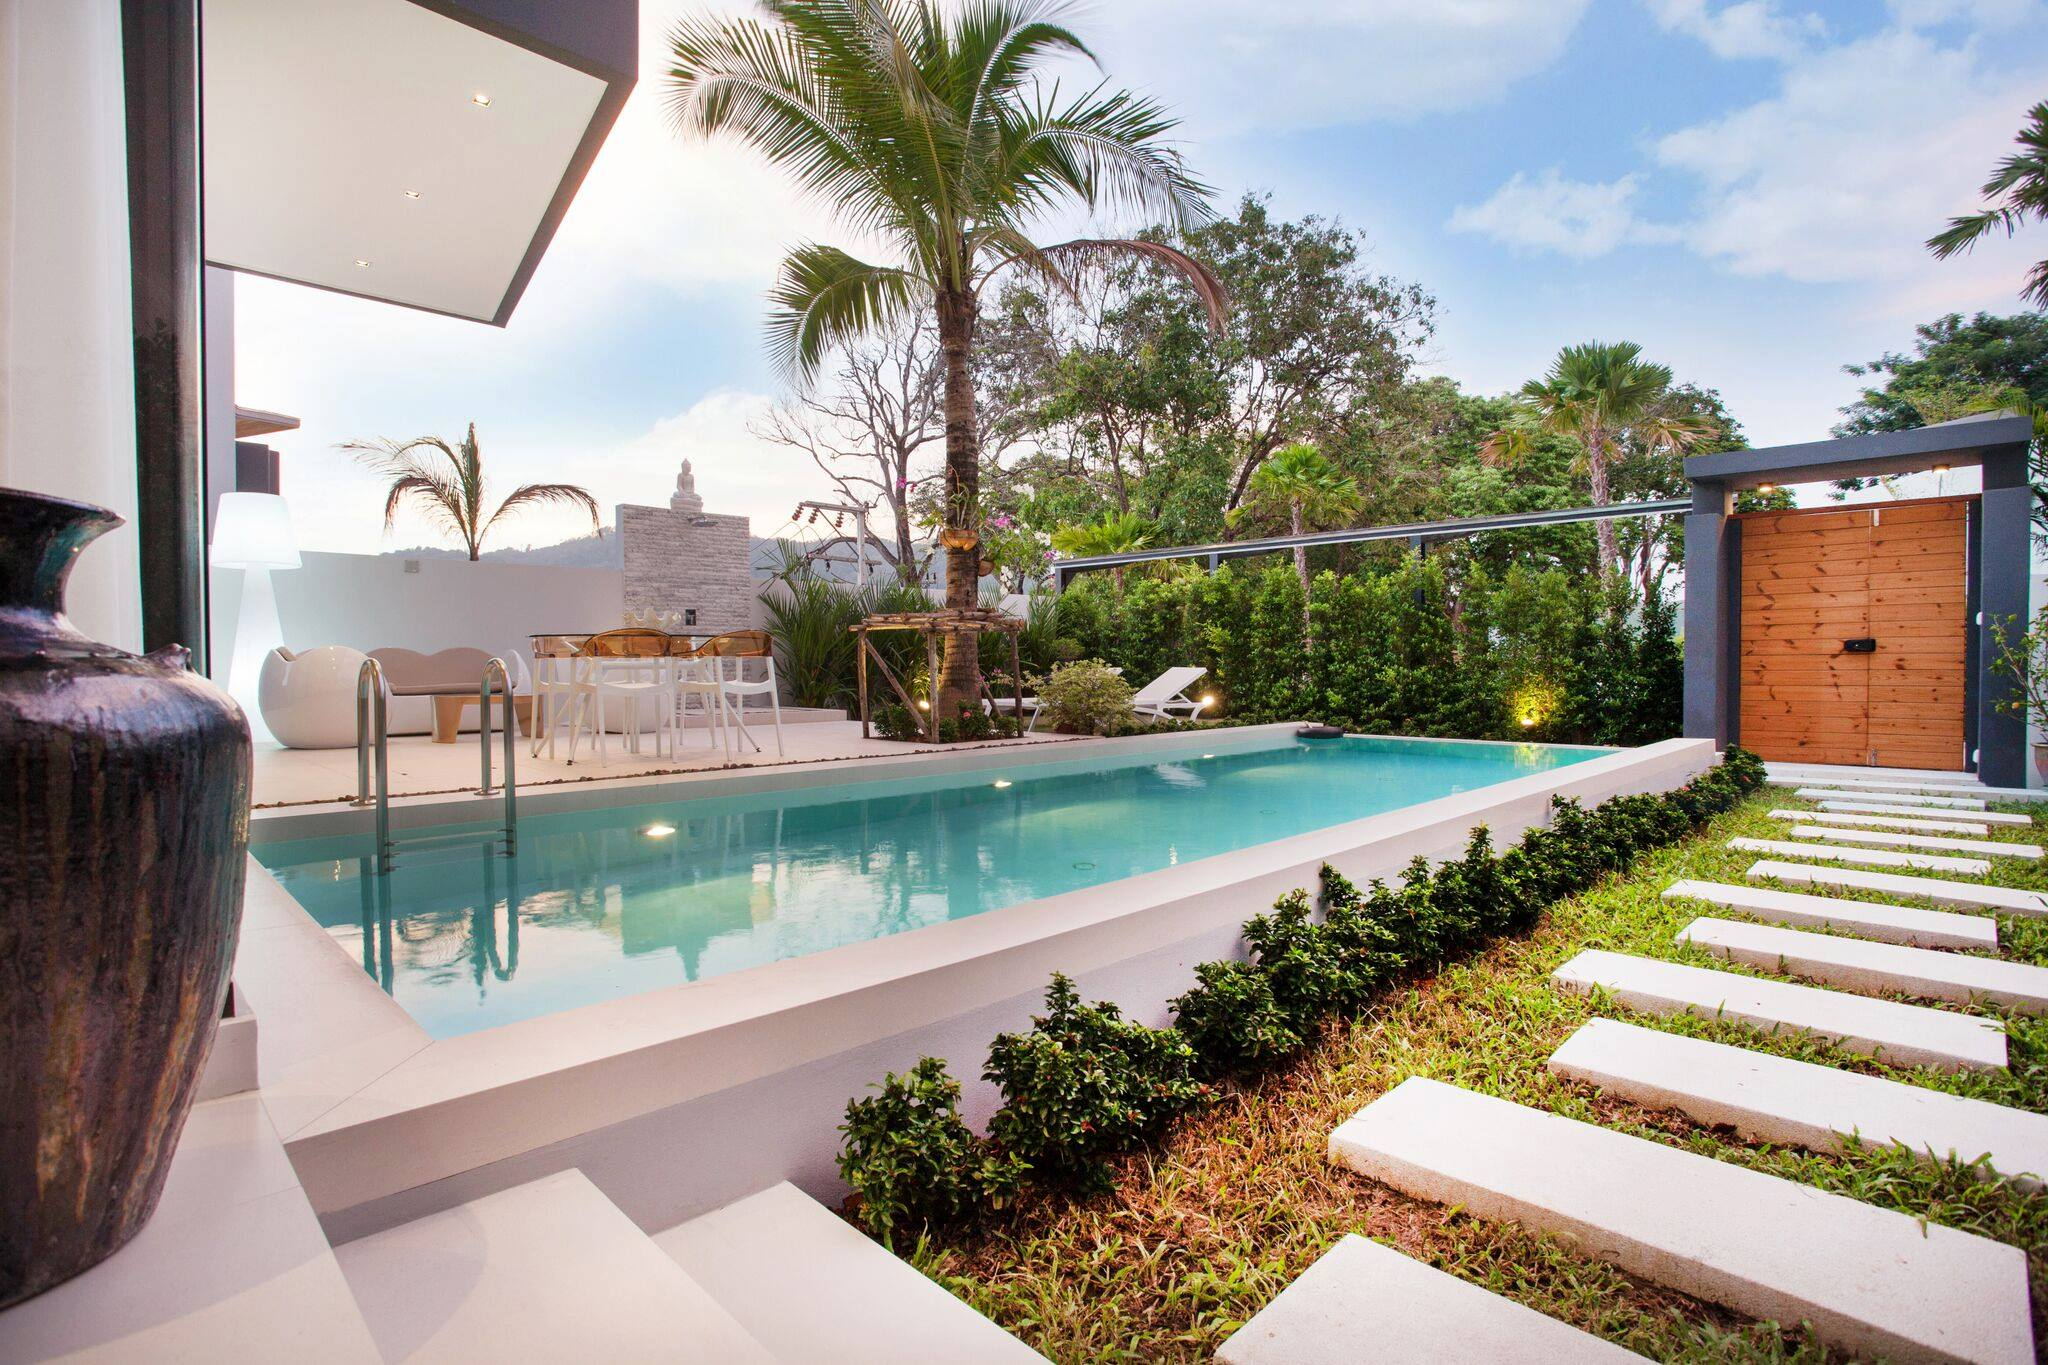 Phuket Real Estate Agency – Nai Harn Beach (35)